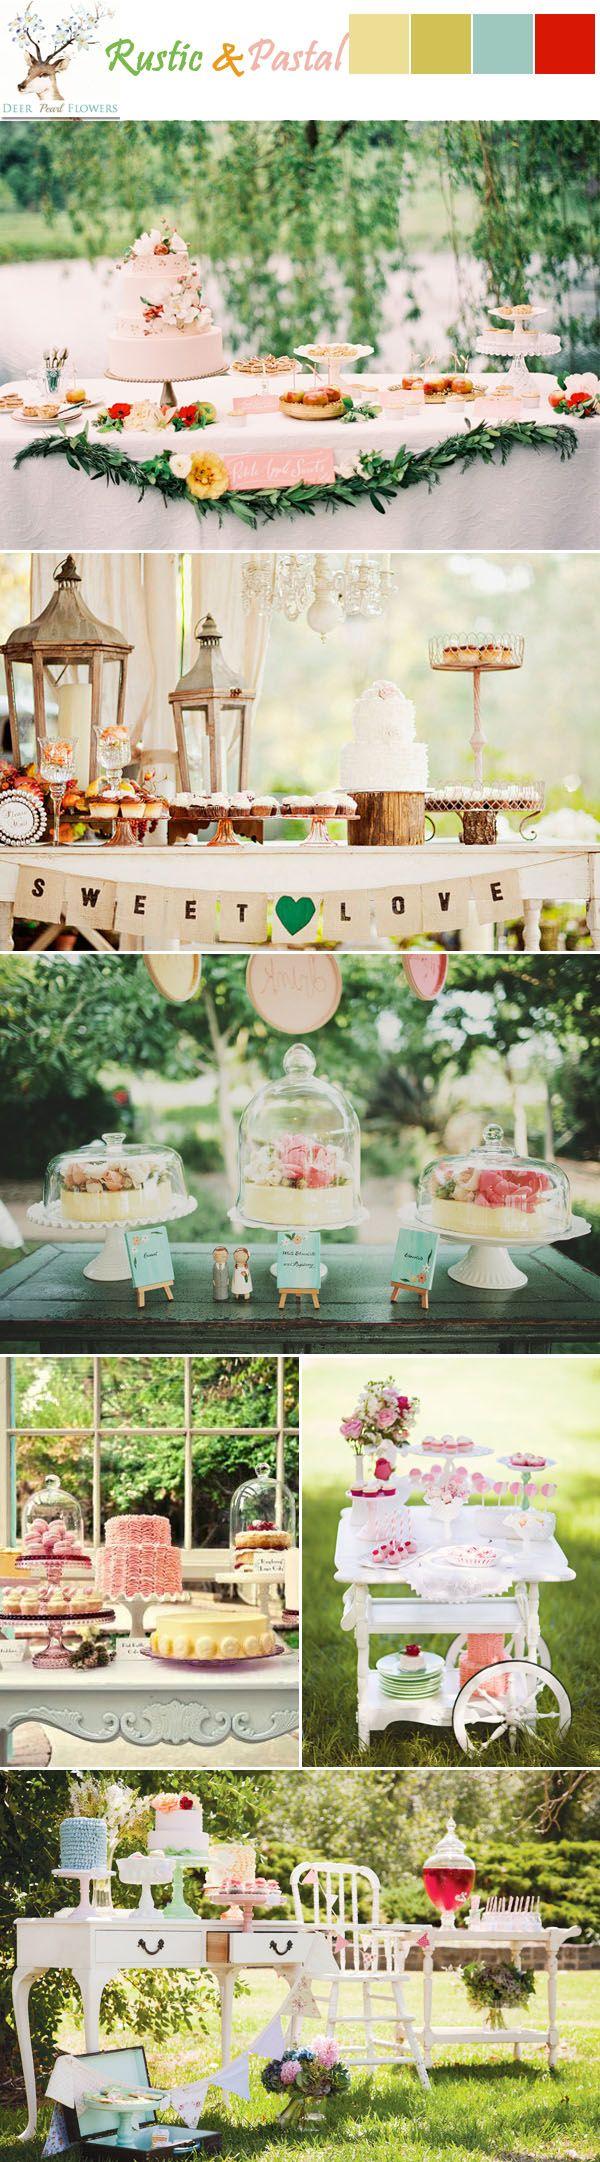 rustic pastel green red pink blue wedding dessert table ideas